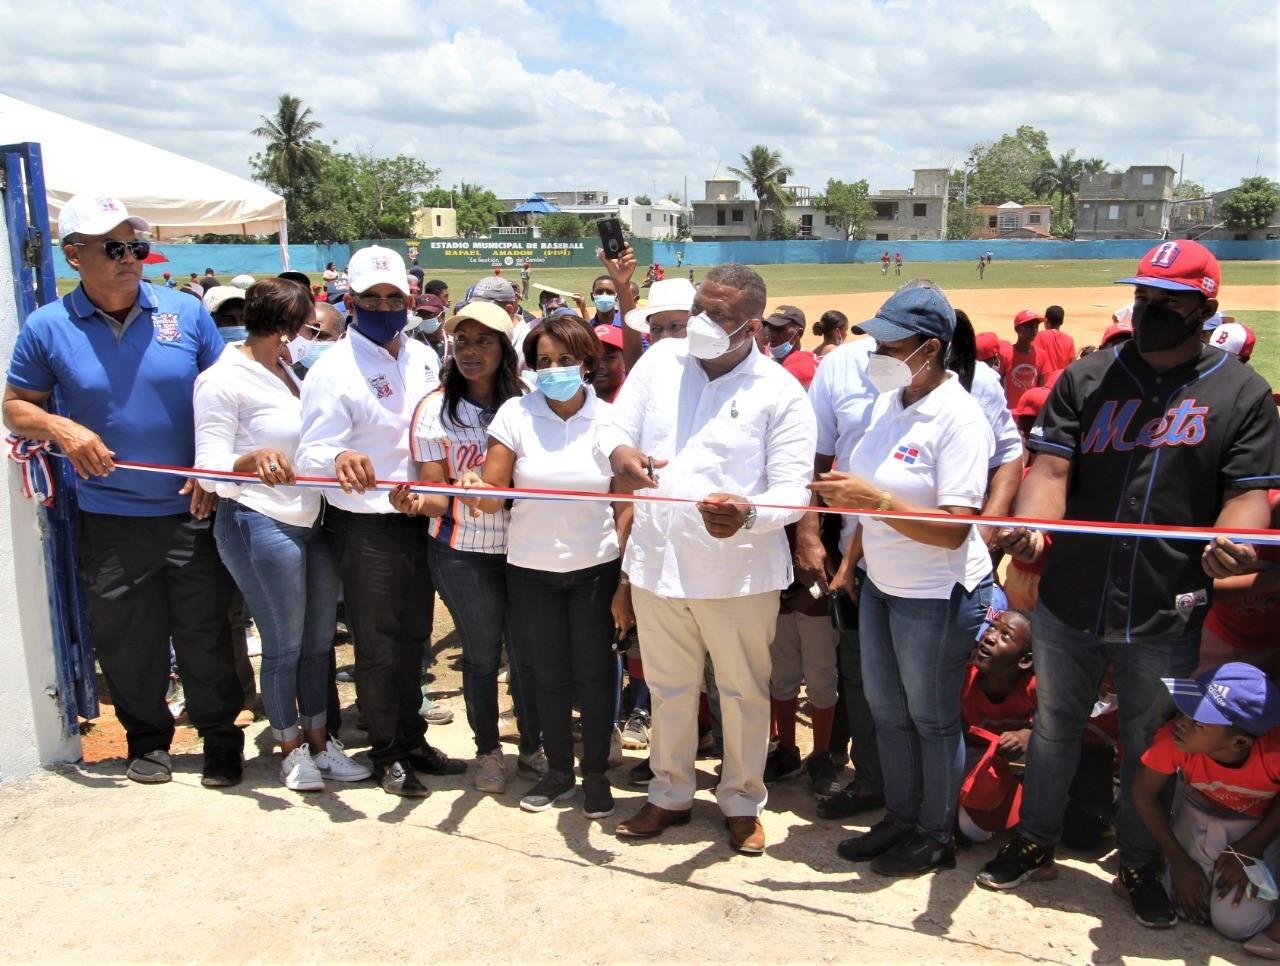 Dan apertura a reacondicionado estadio de béisbol en Guerra